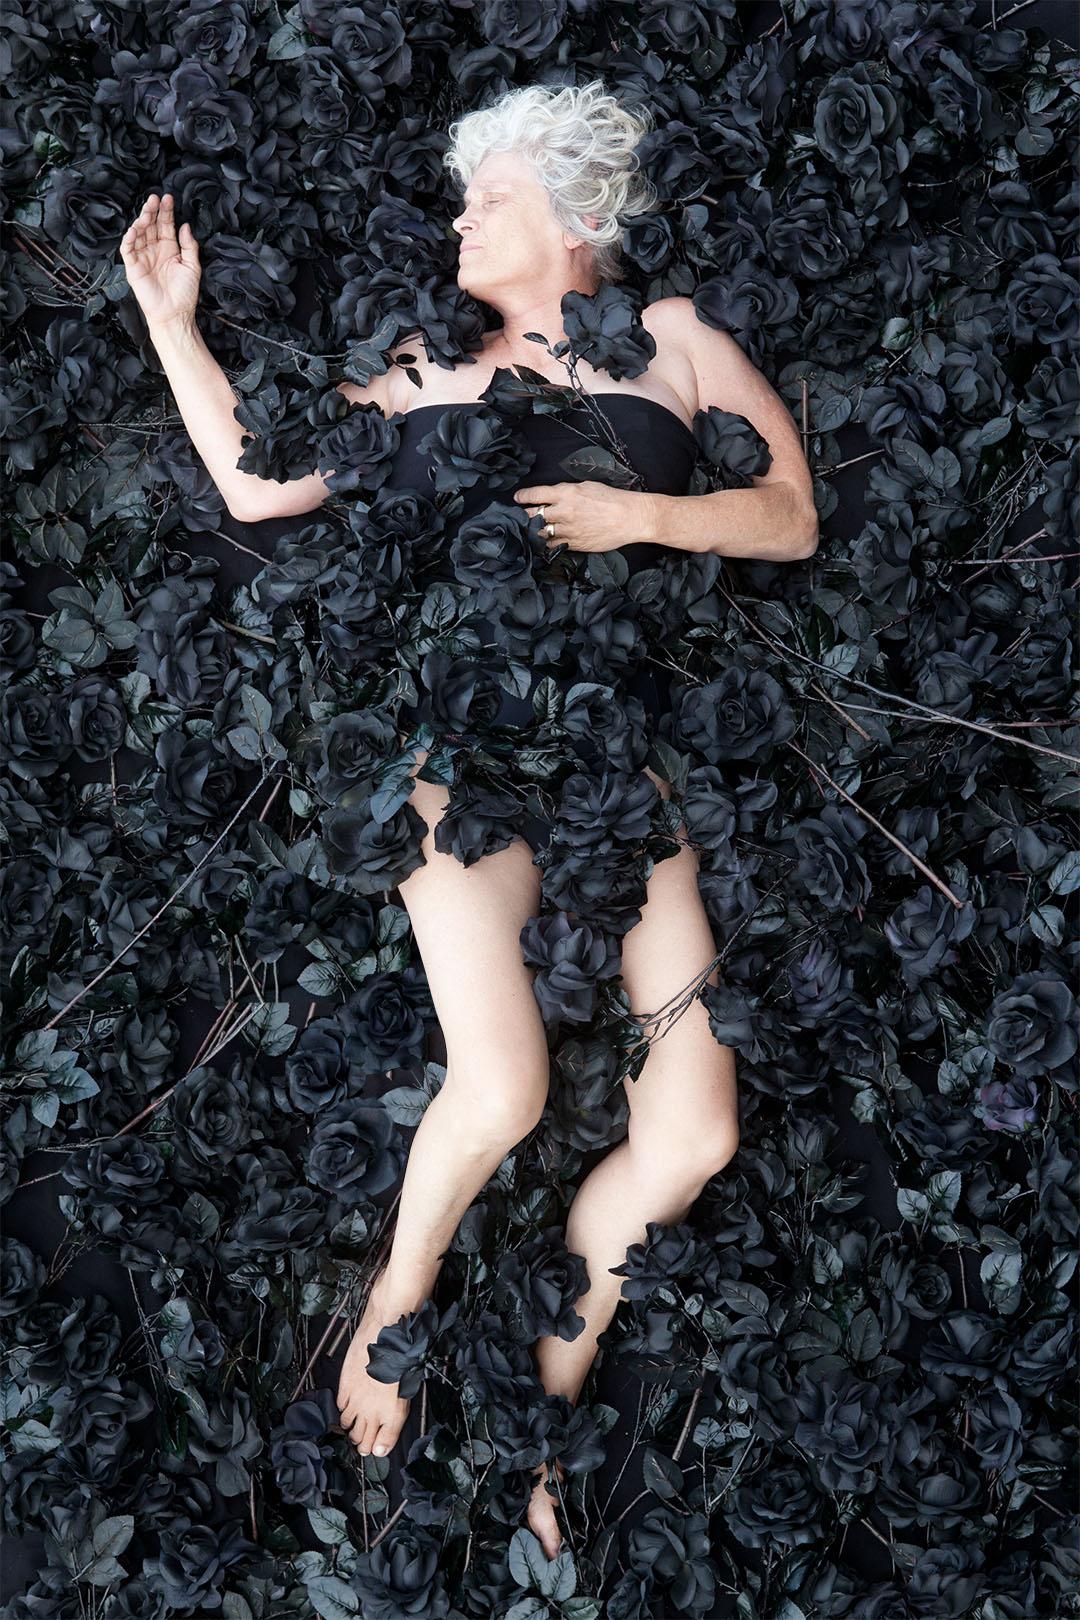 'Self Portrait with Black Roses' - 30cm x 110cm - Chromogenic Print - 2014